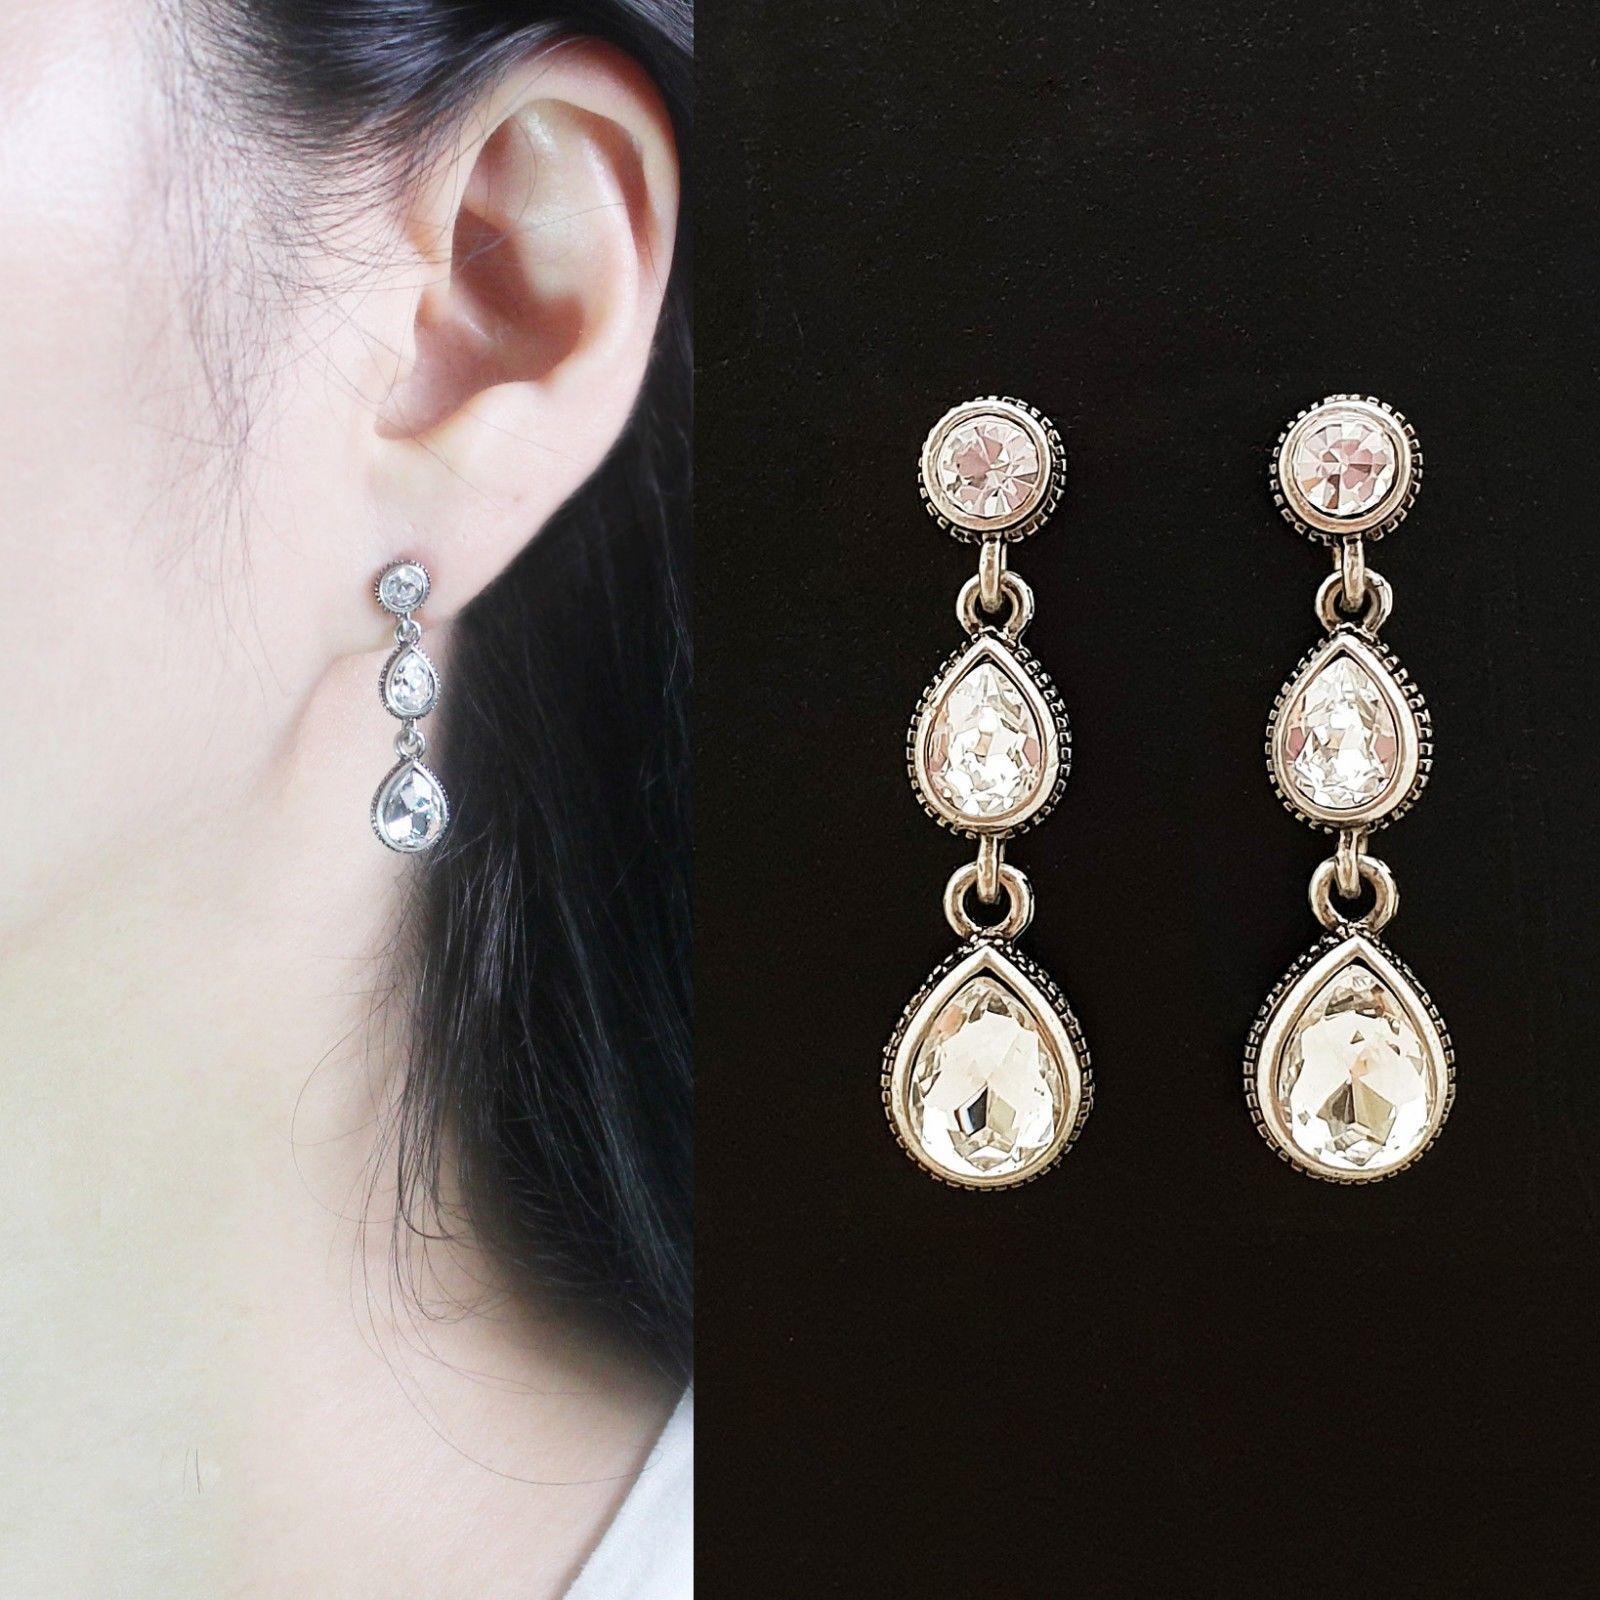 Tiered Round Water Drop Teardrop Shape Made With Swarovski Stone Dangle Earrings